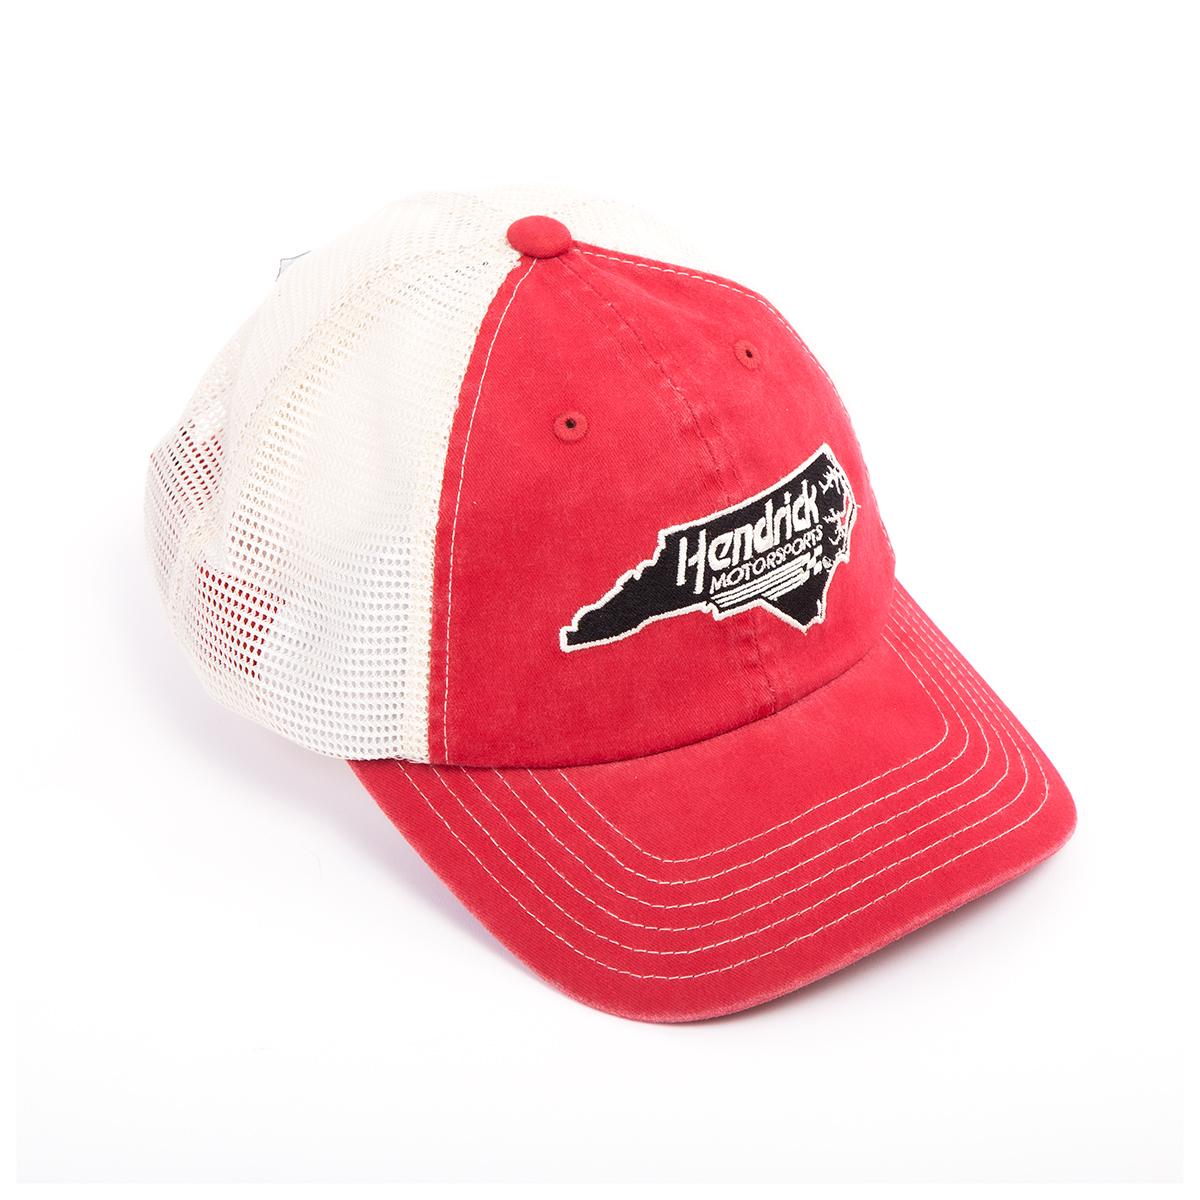 NASCAR Hendrick Motorsports Red Carolina Hat